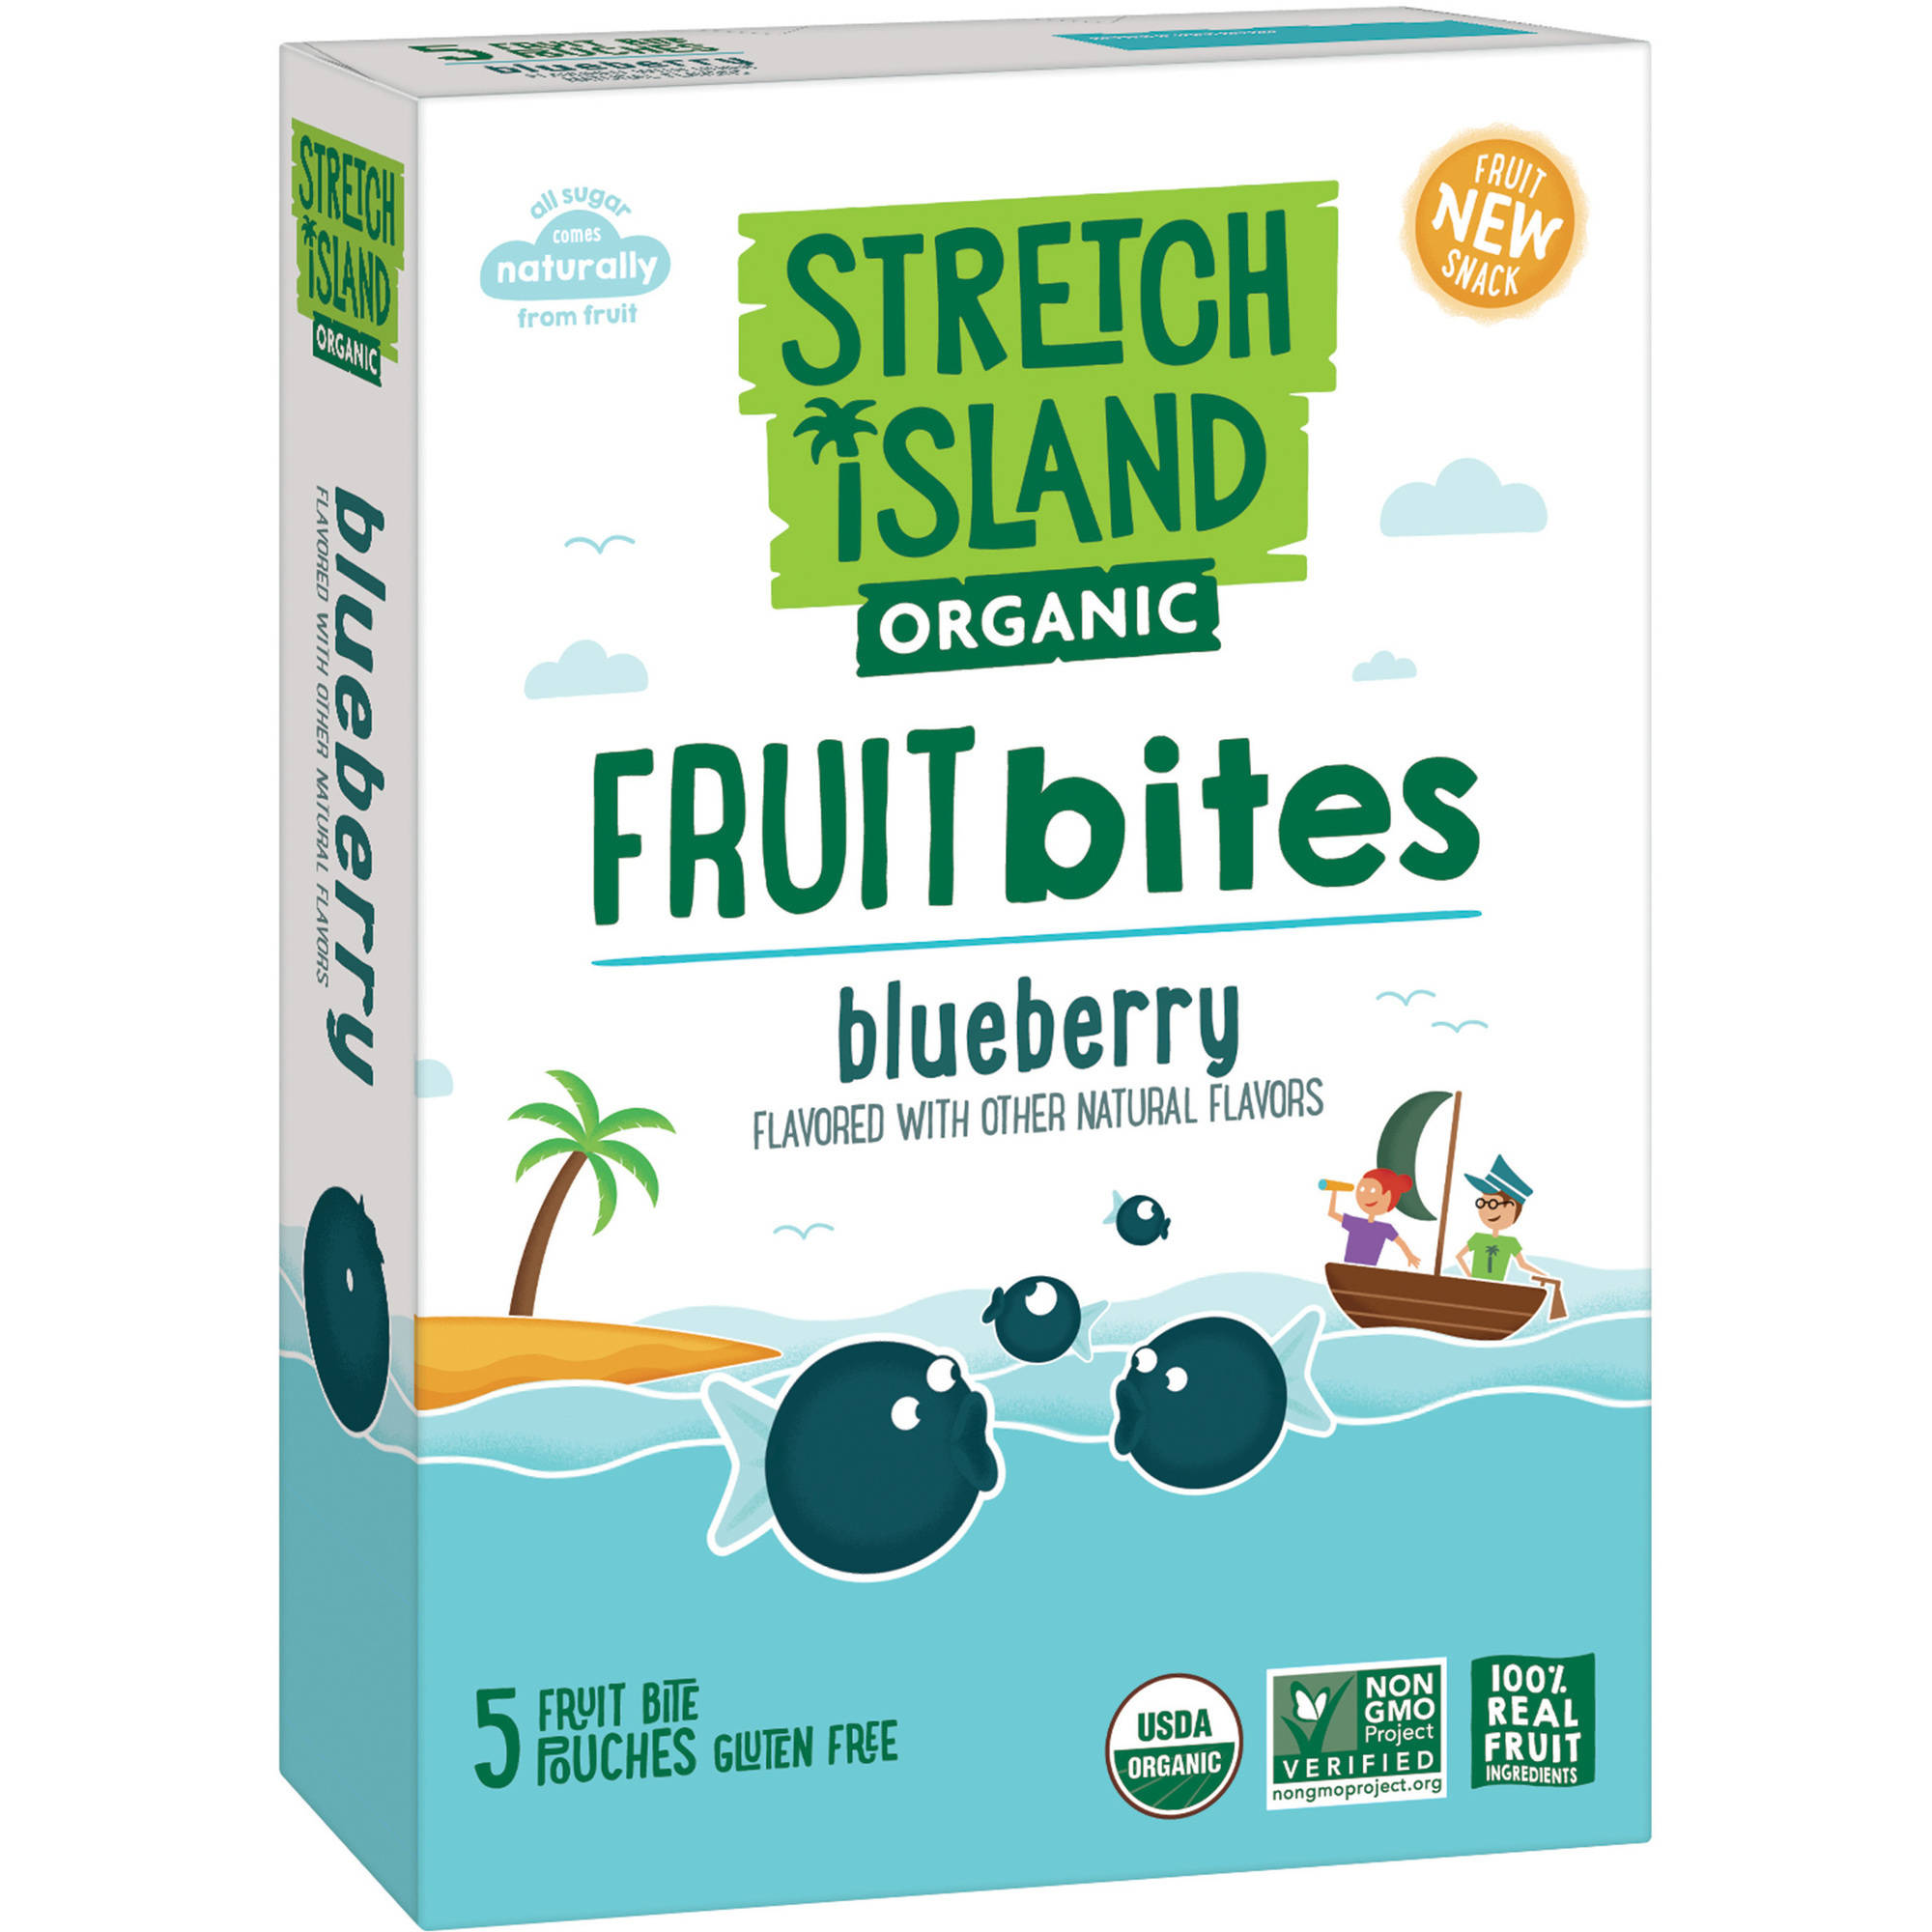 (2 Pack) Stretch Island Organic Blueberry Fruit Bites, 0.7 oz, 5 count